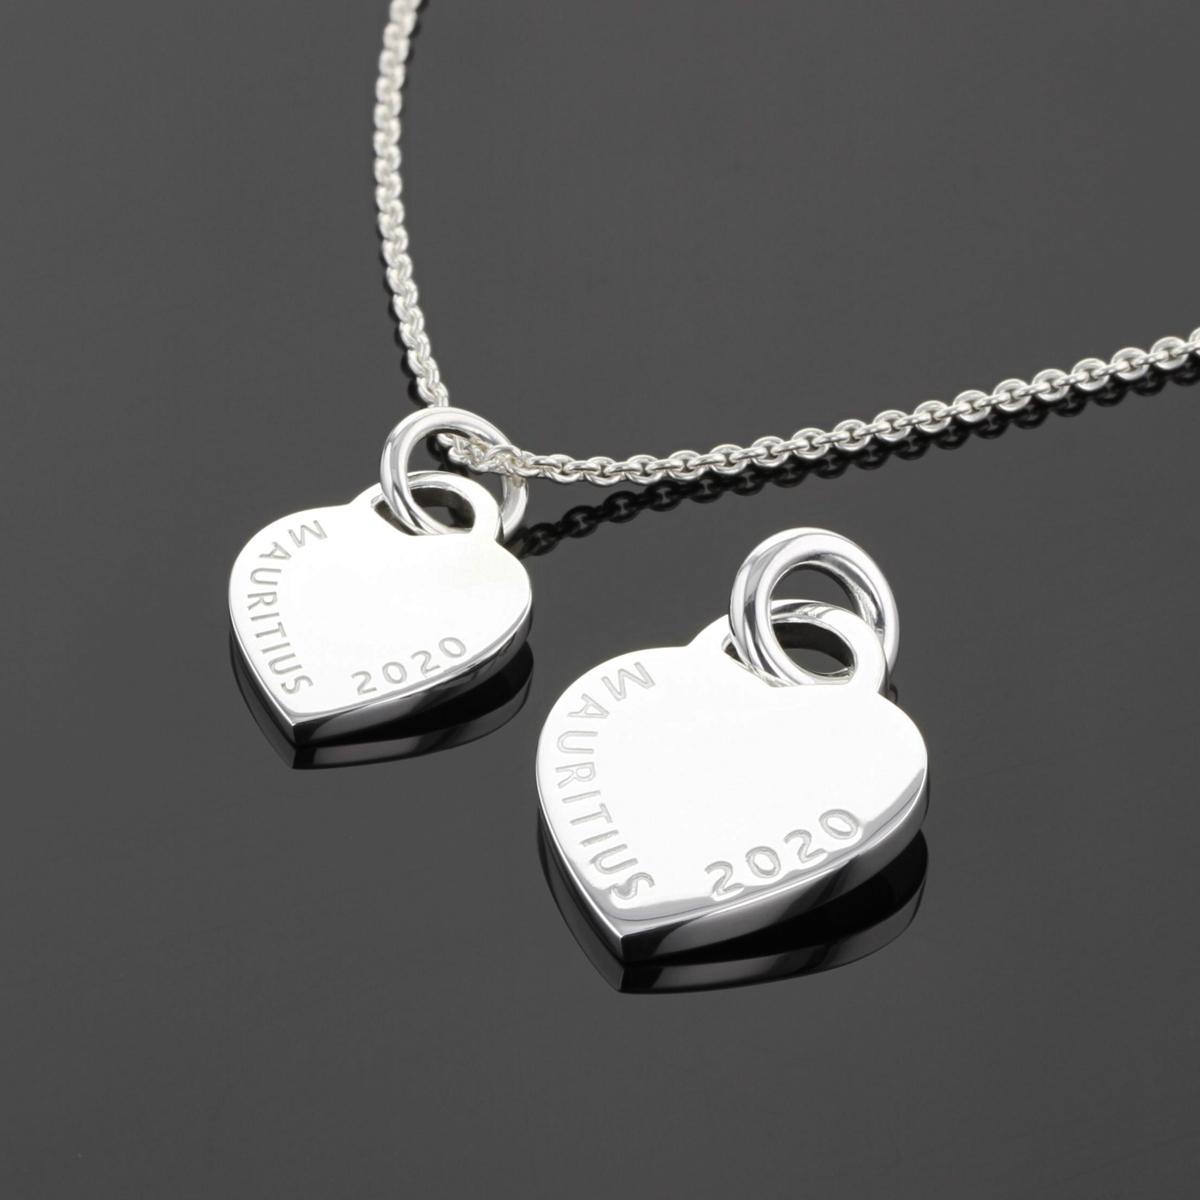 Personalised heart pendants